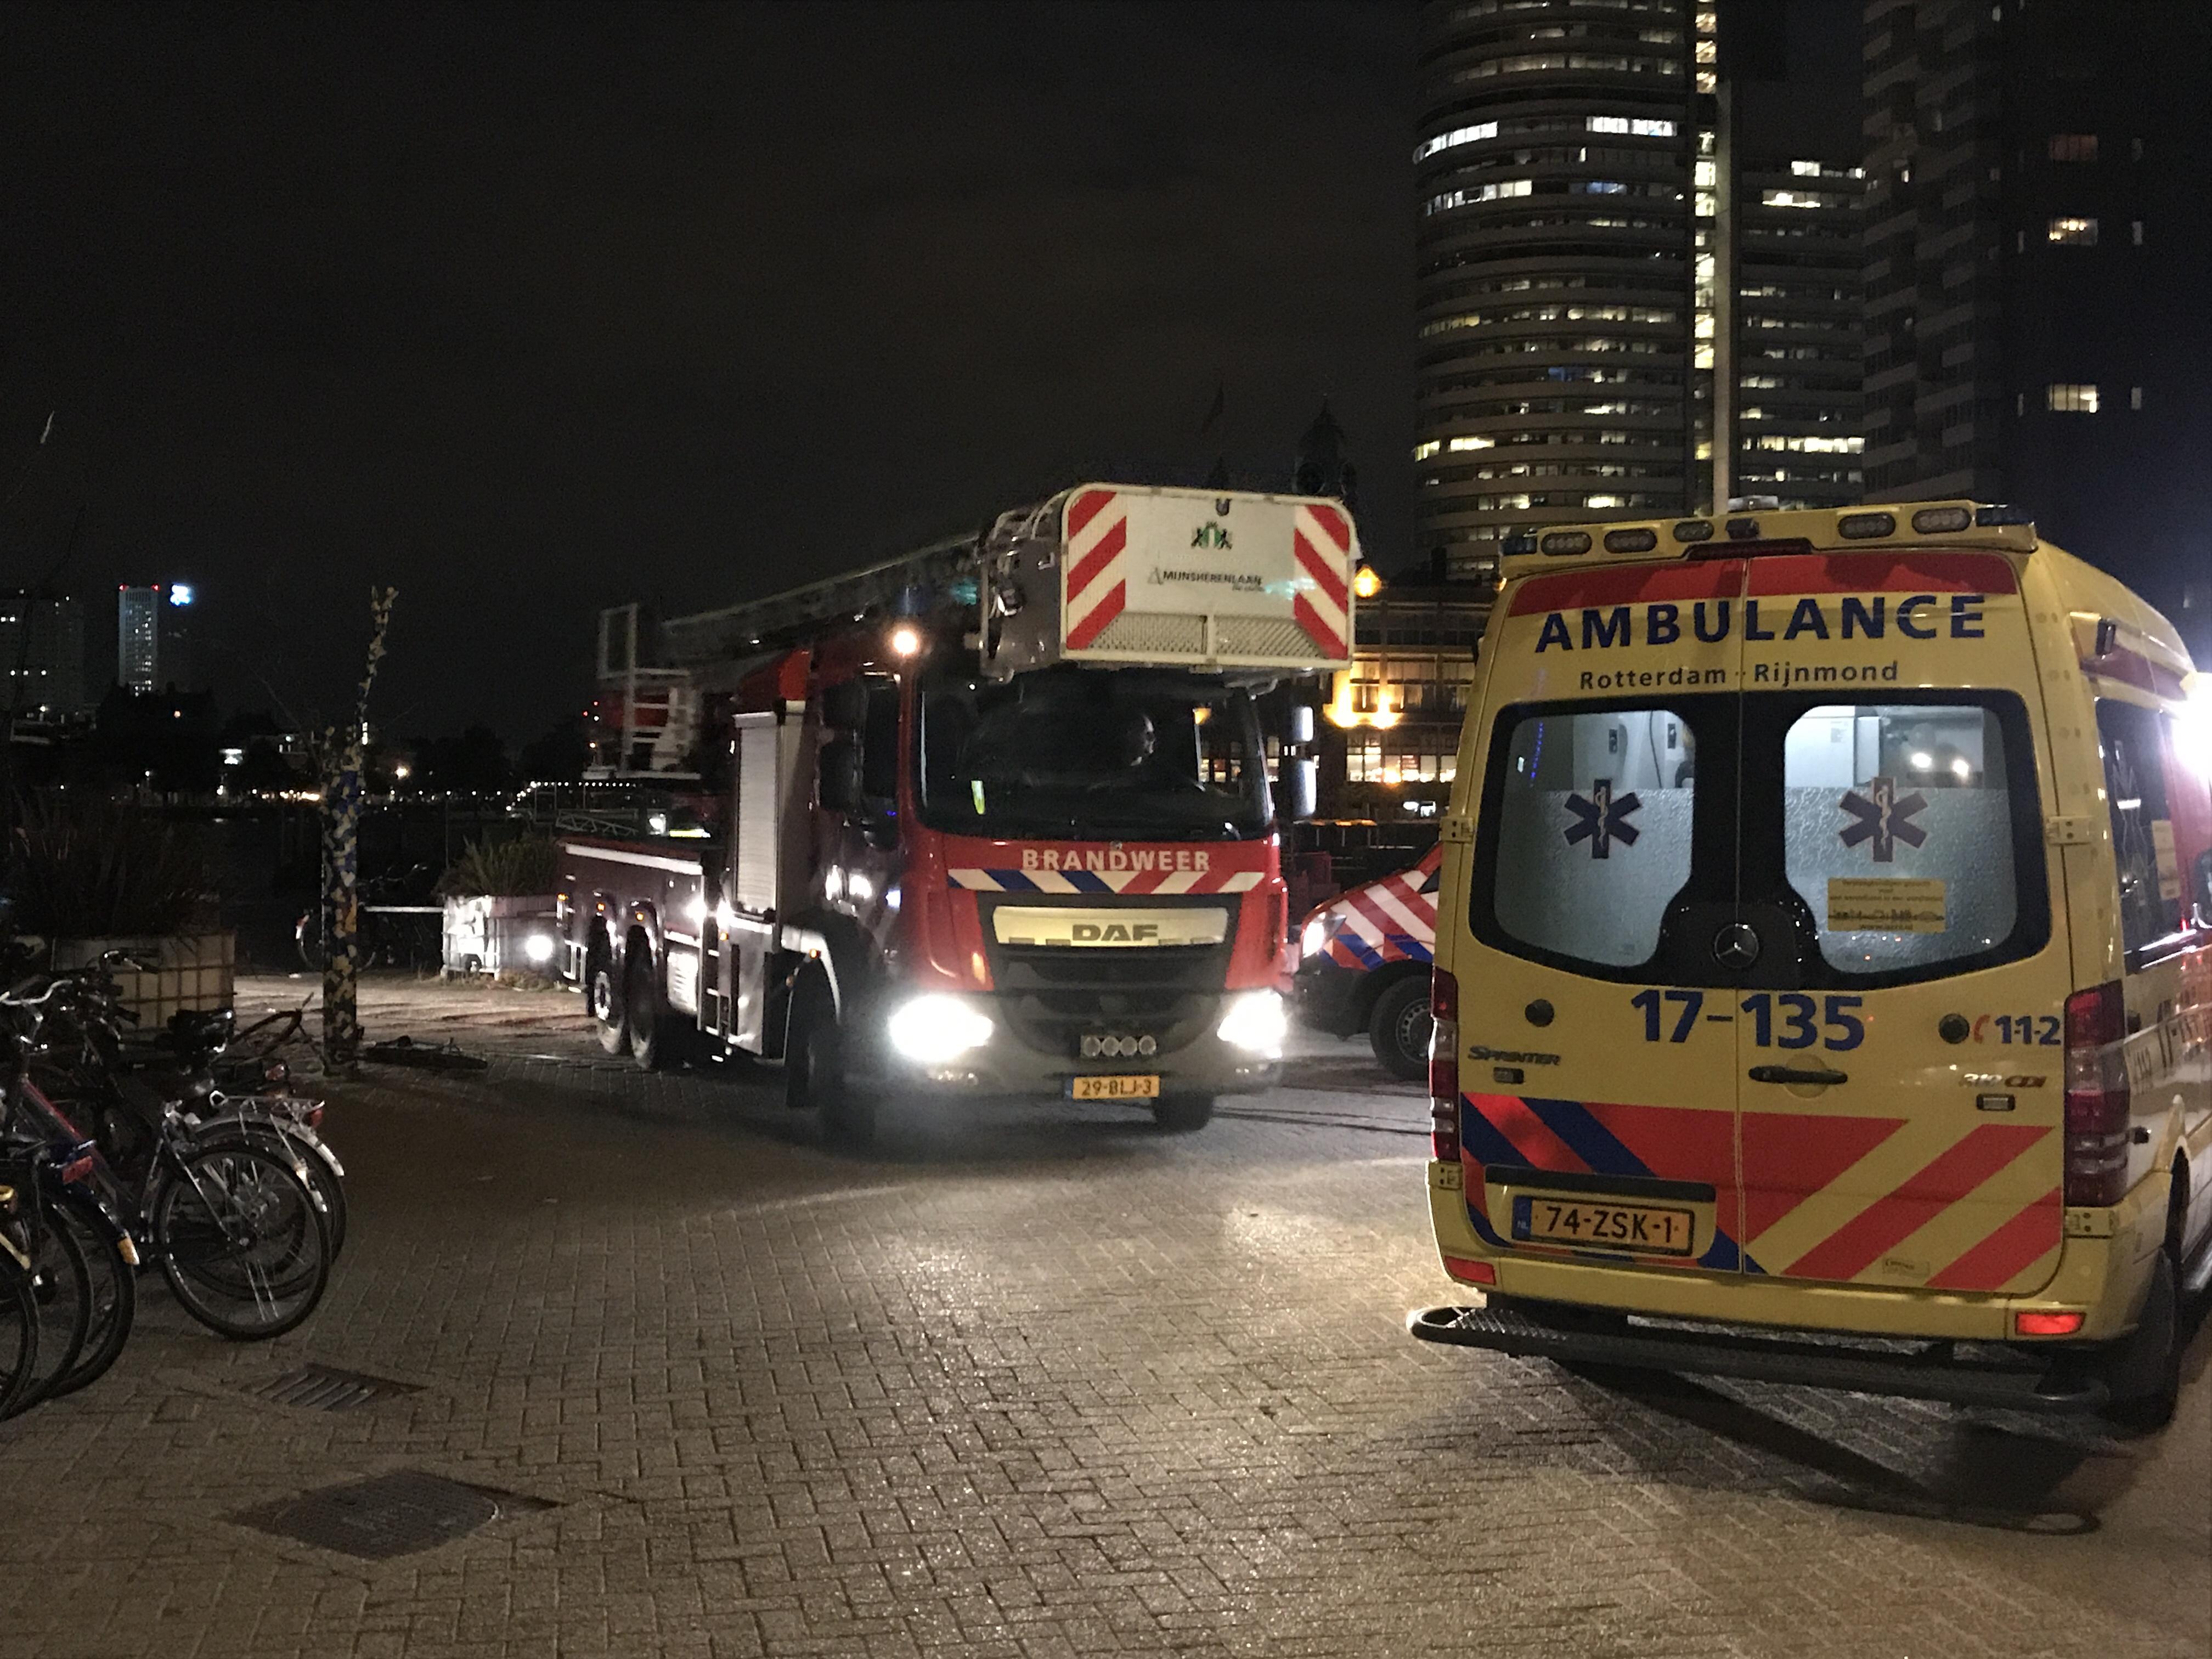 Persoon te water Fenix loodsen Rijnhaven.